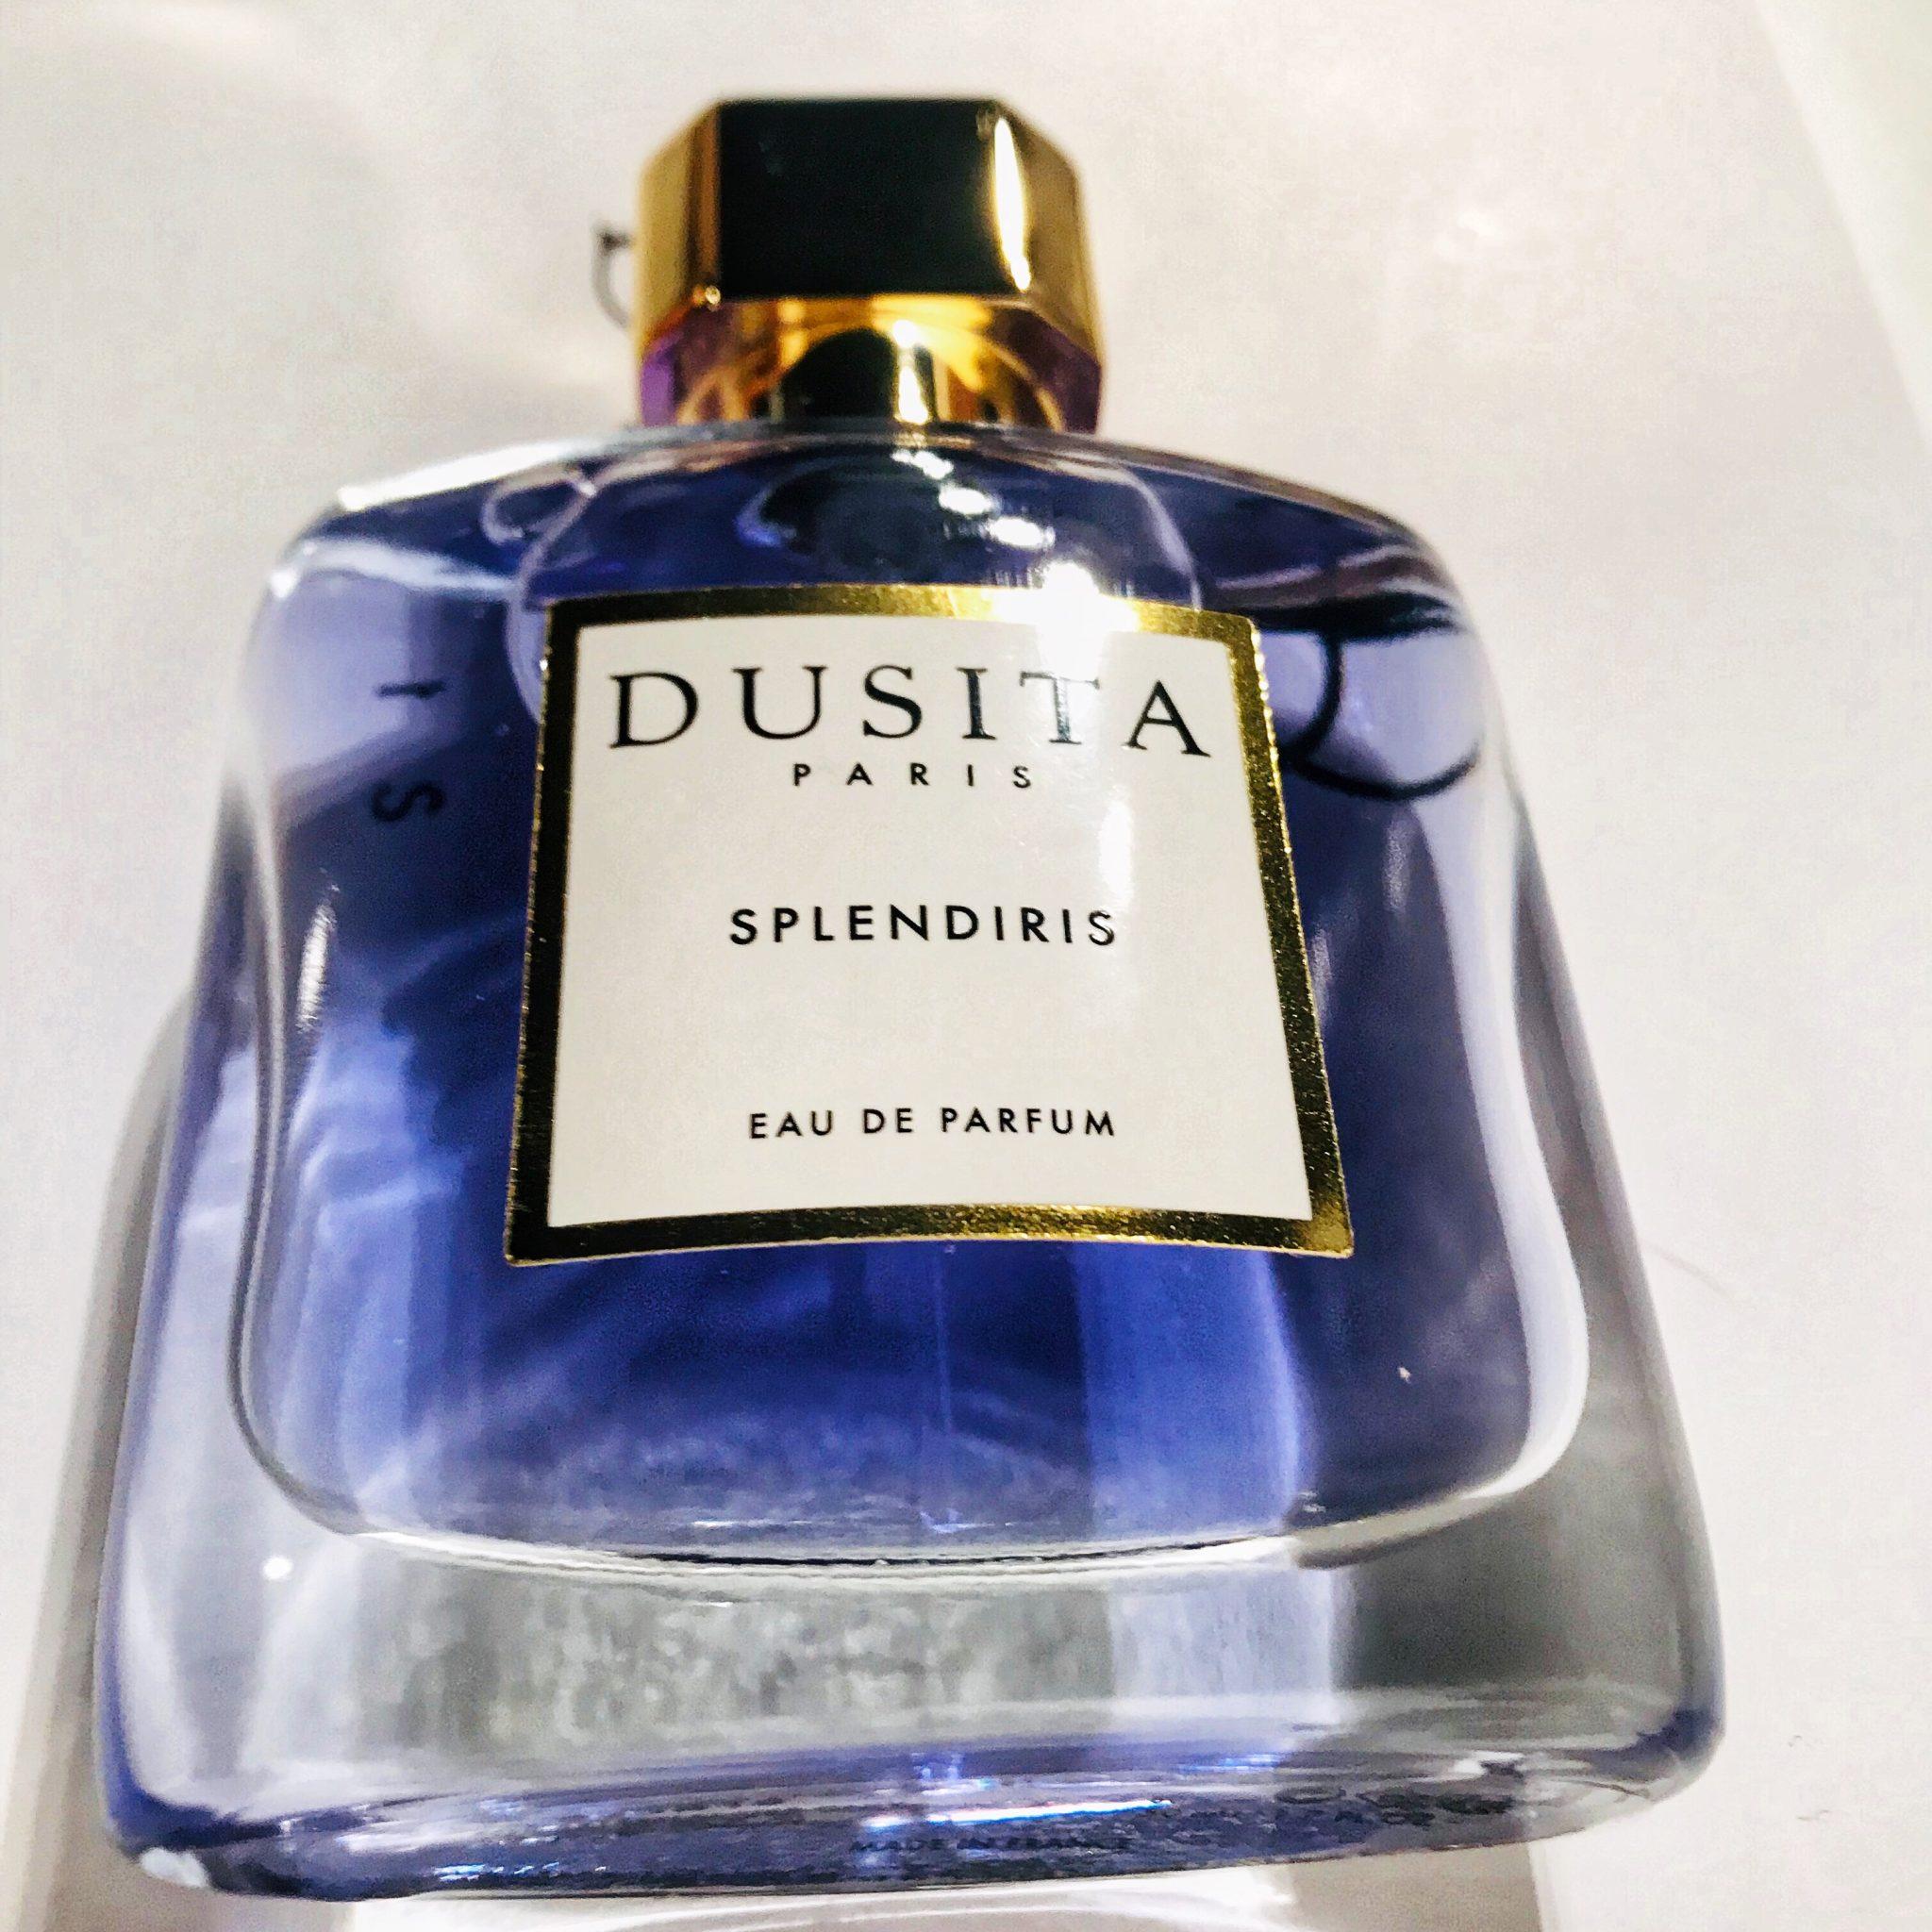 Dusita Splendiris